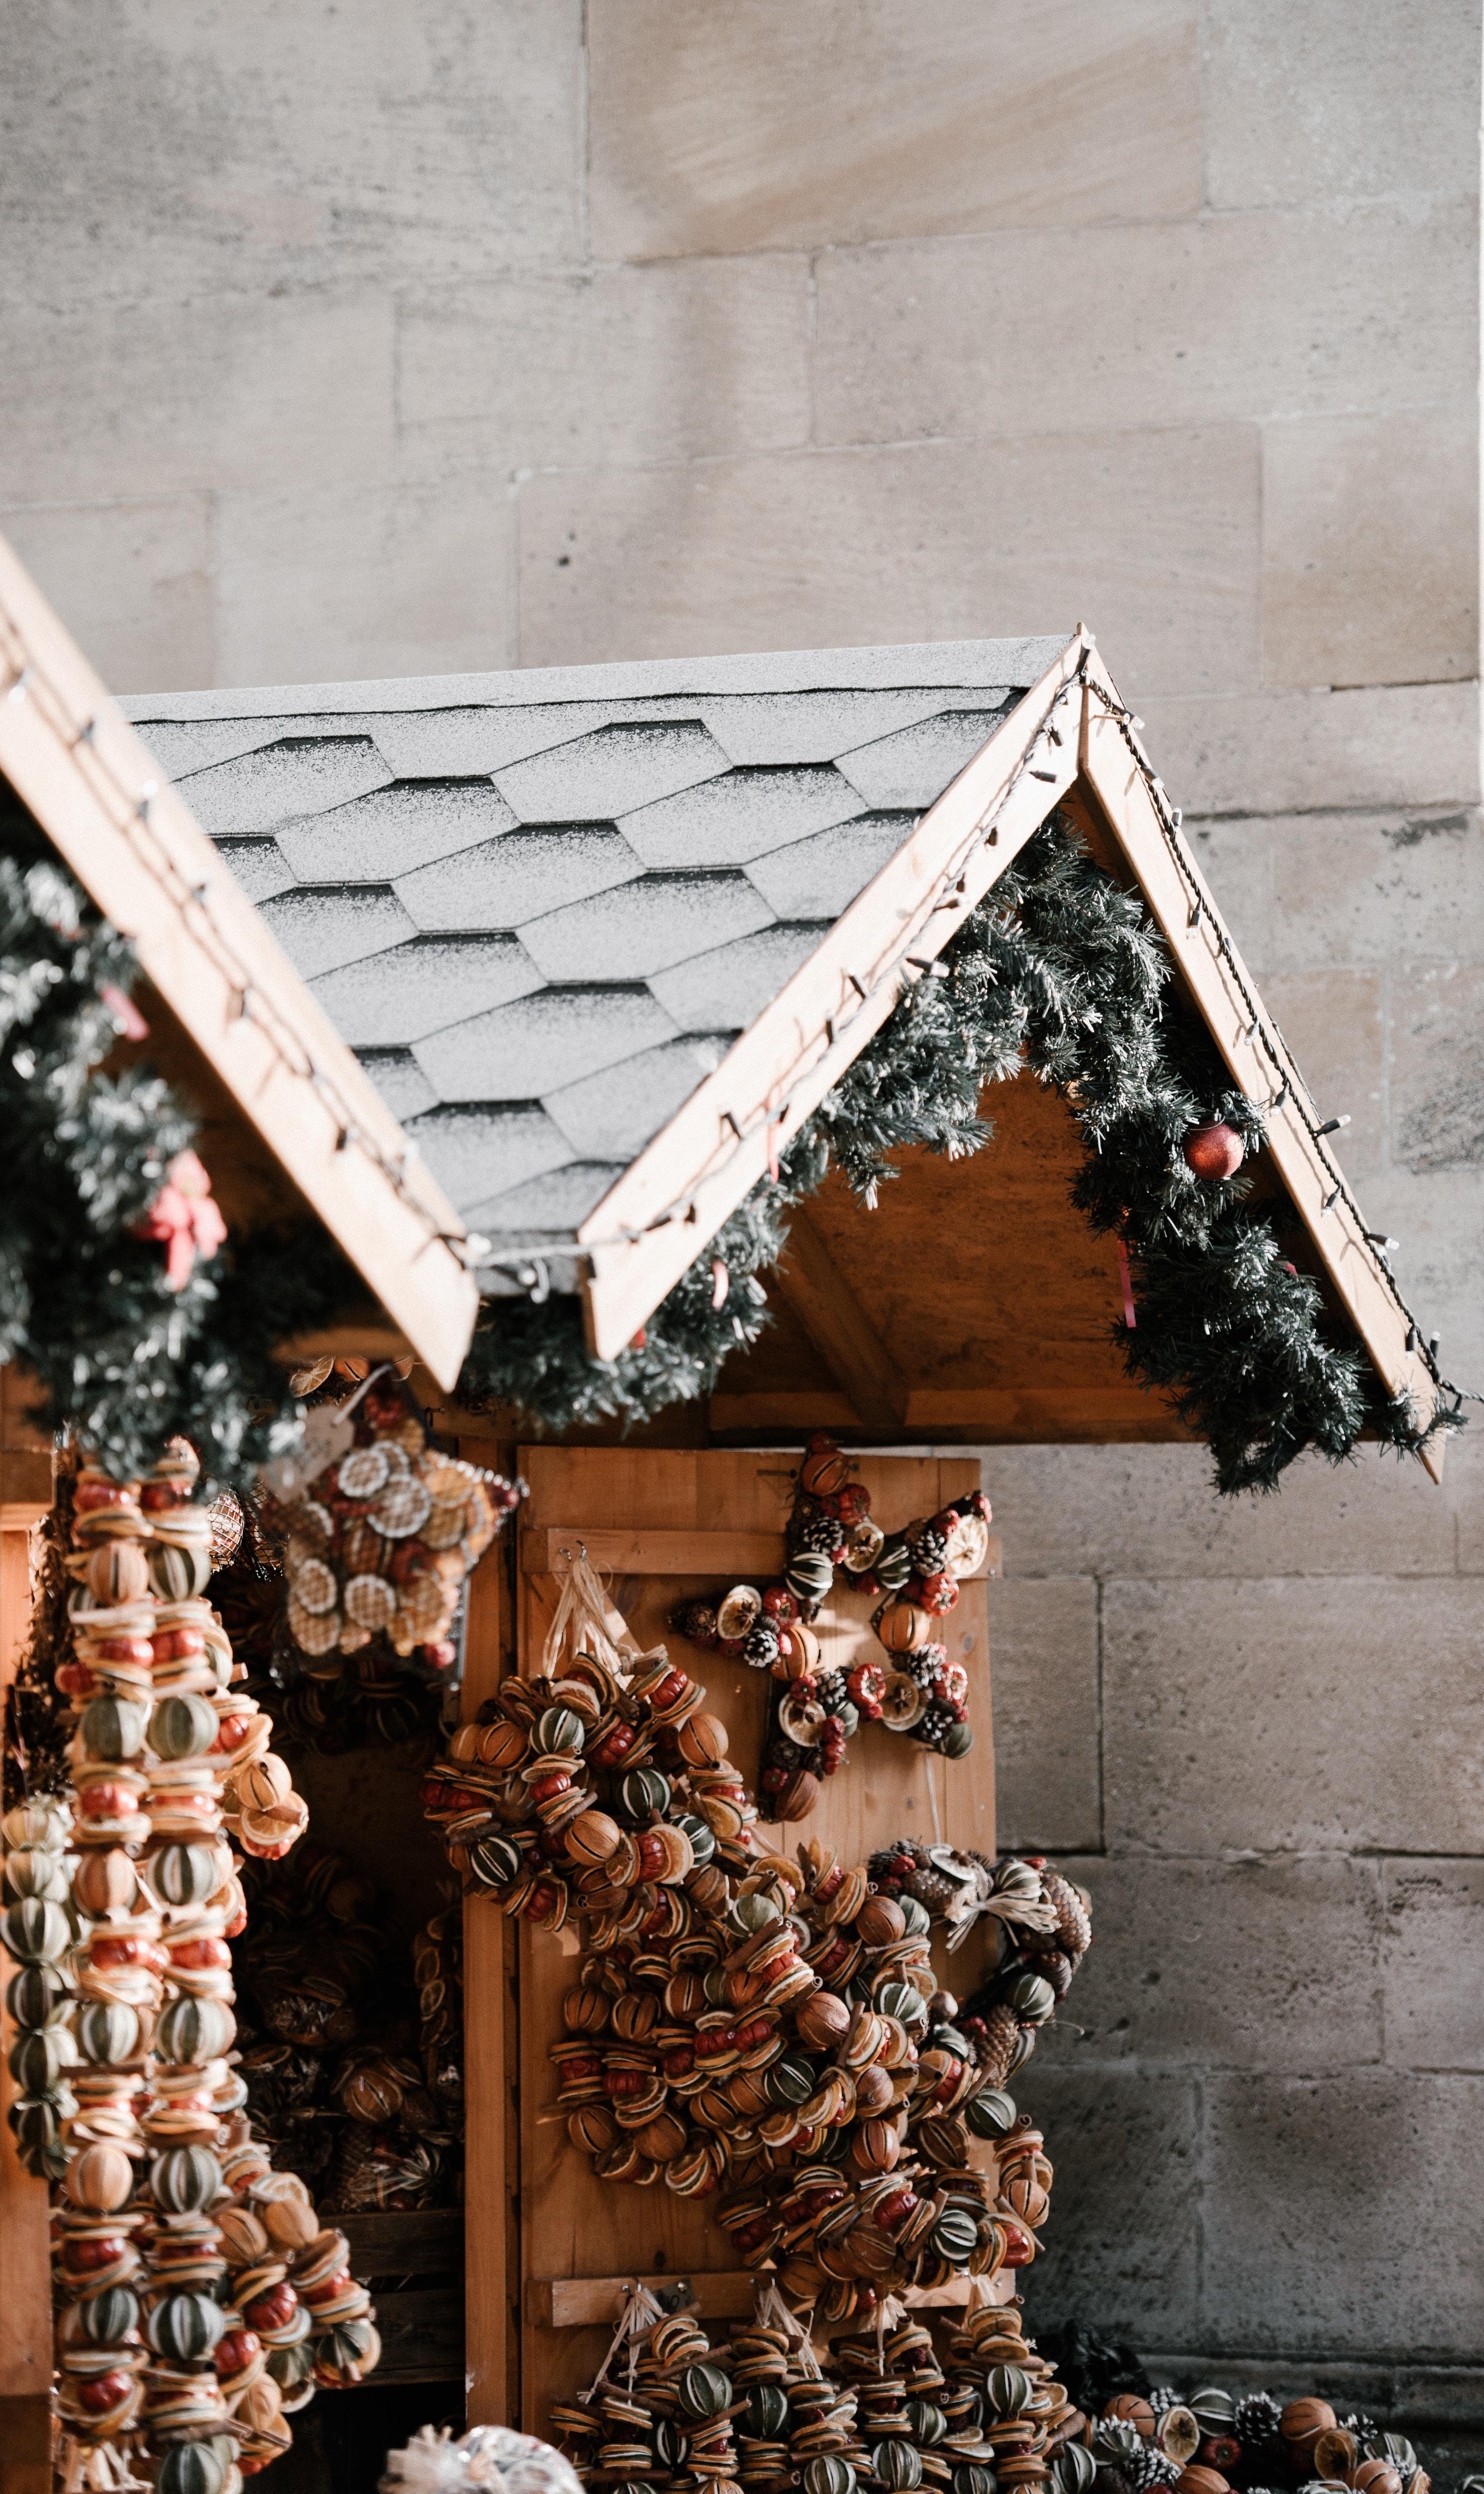 photo of Christmas tree miniature